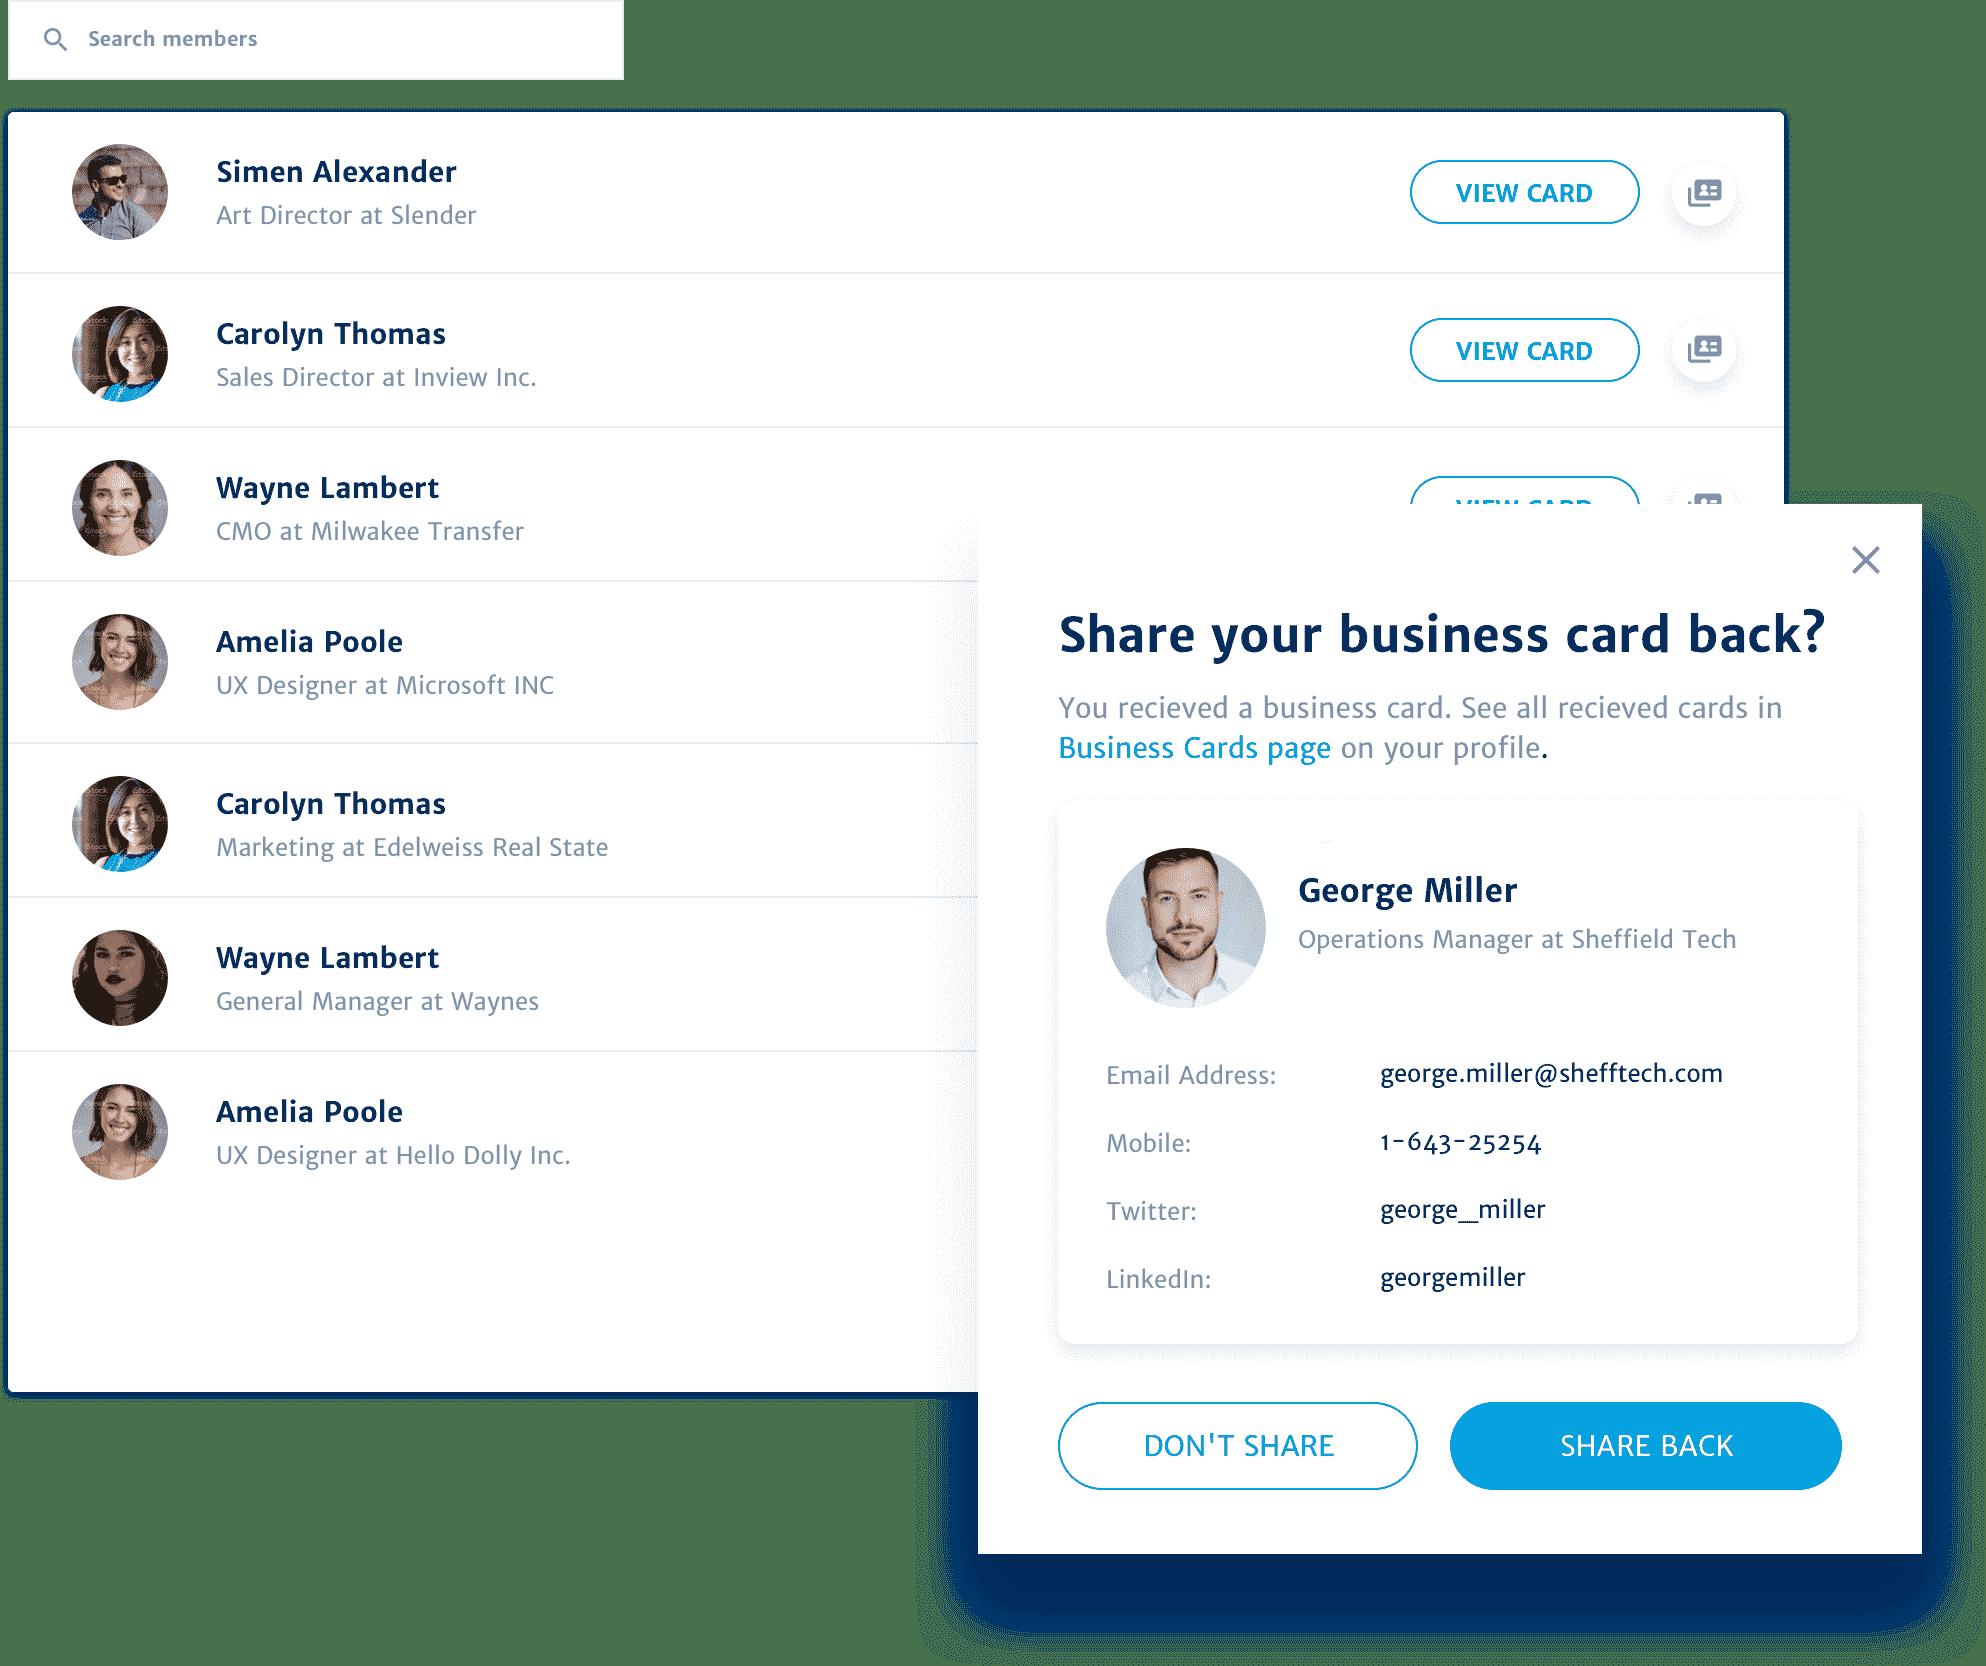 webinar digital business card exchange